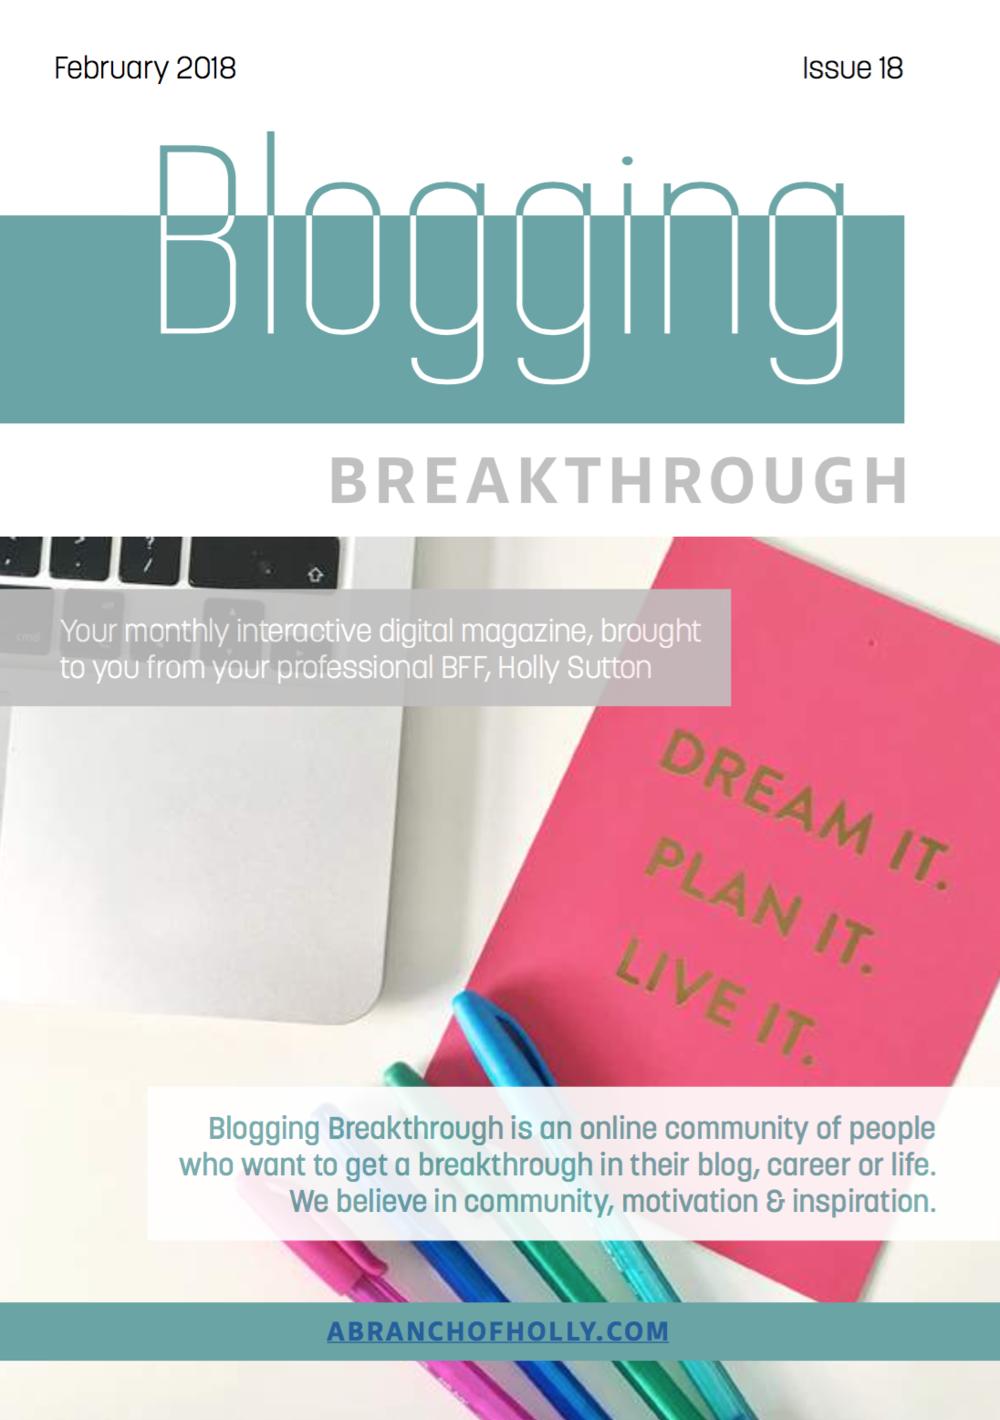 blogging breakthrough february 2018 issue 18